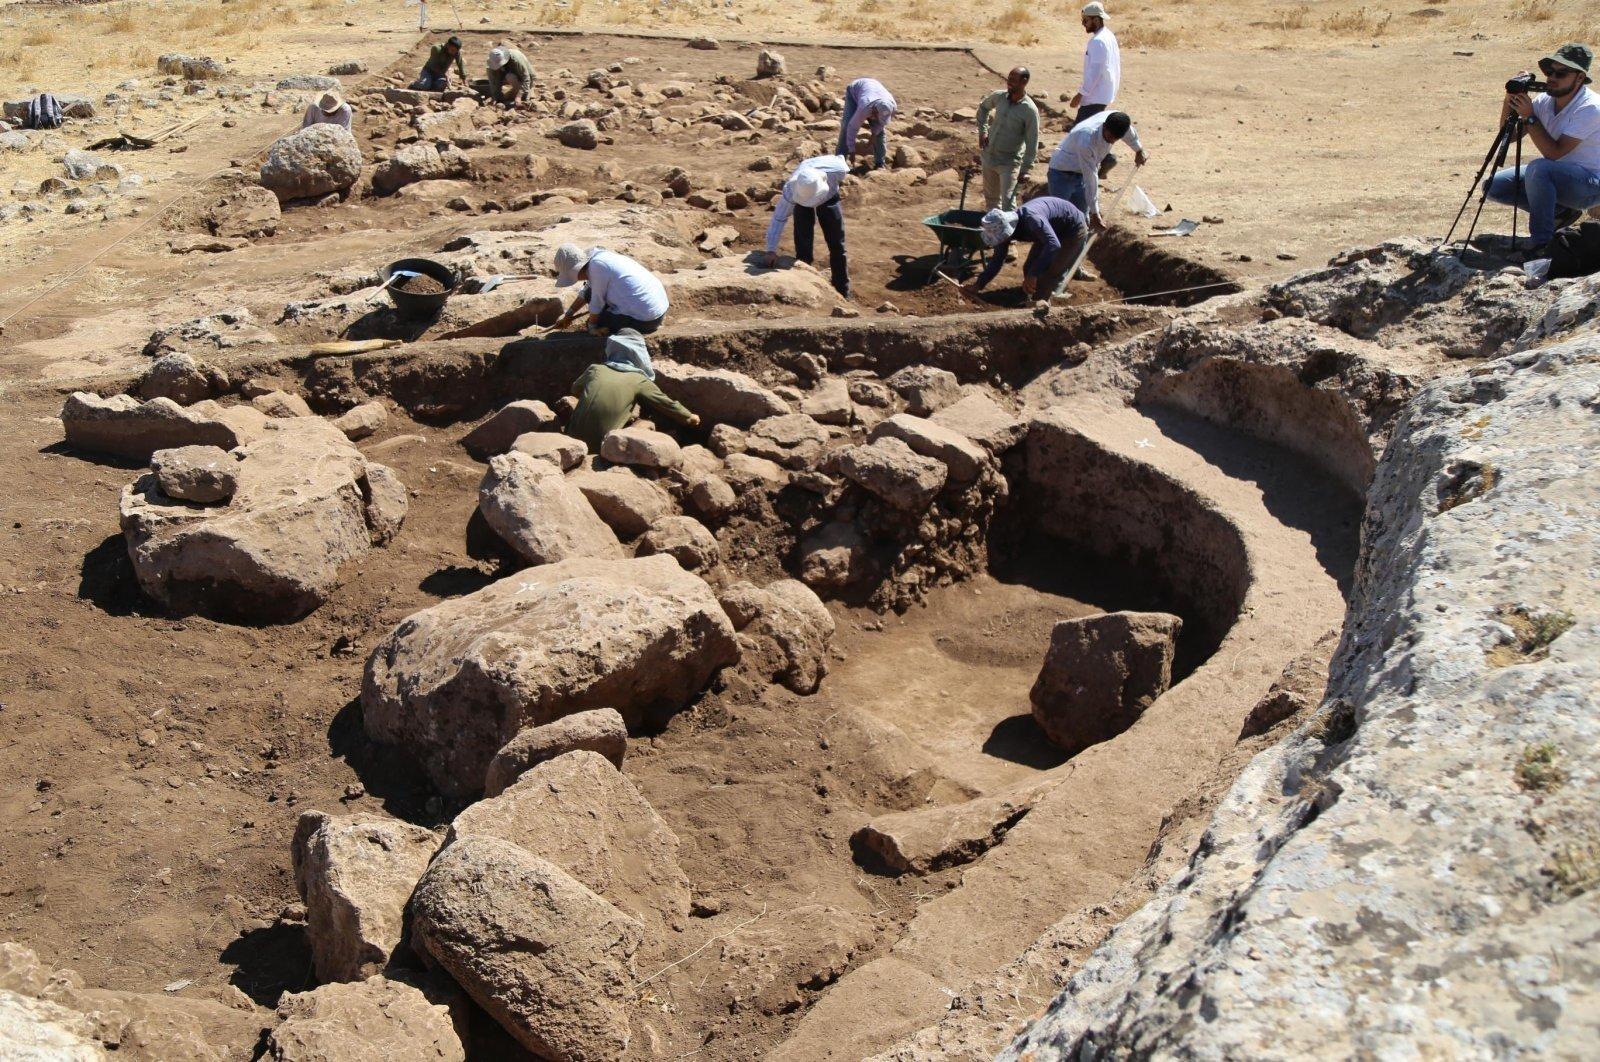 Archaeologists work at the historical site of Karahantepe, Şanlıurfa, southeastern Turkey, Nov. 27, 2020. (DHA Photo)